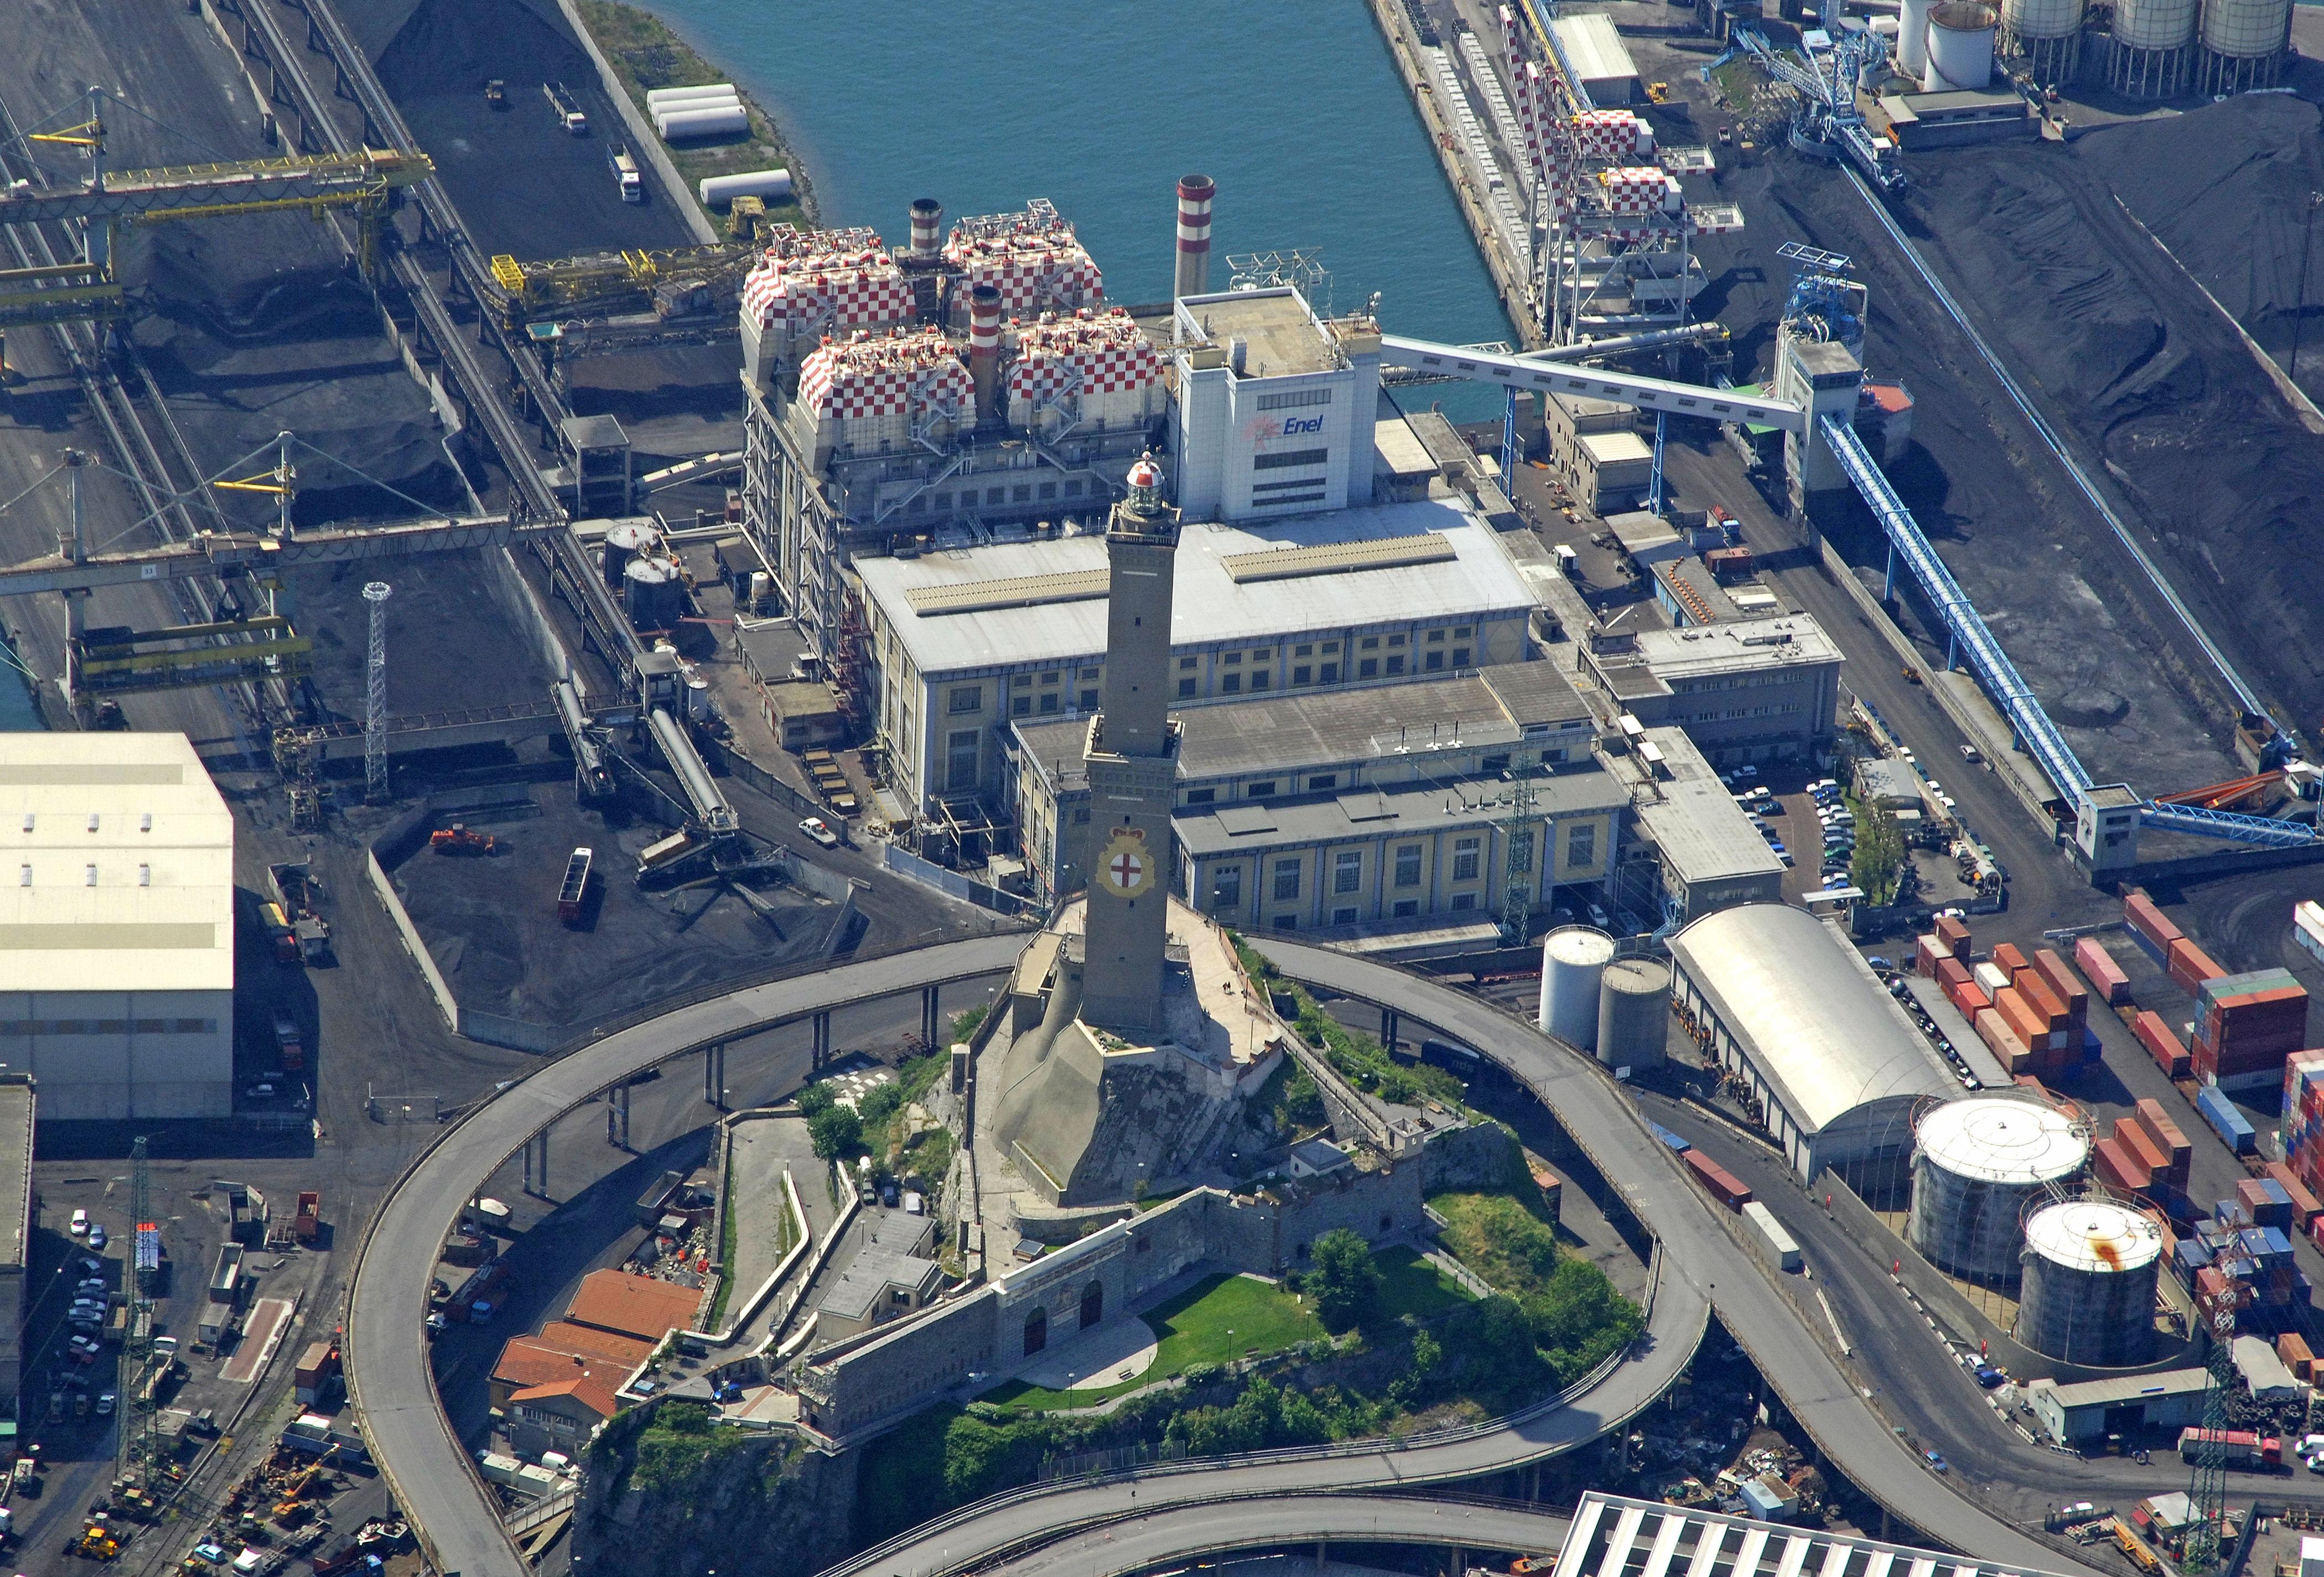 Lanterna Di Genova Light La Lanterna Genoa Lighthouse